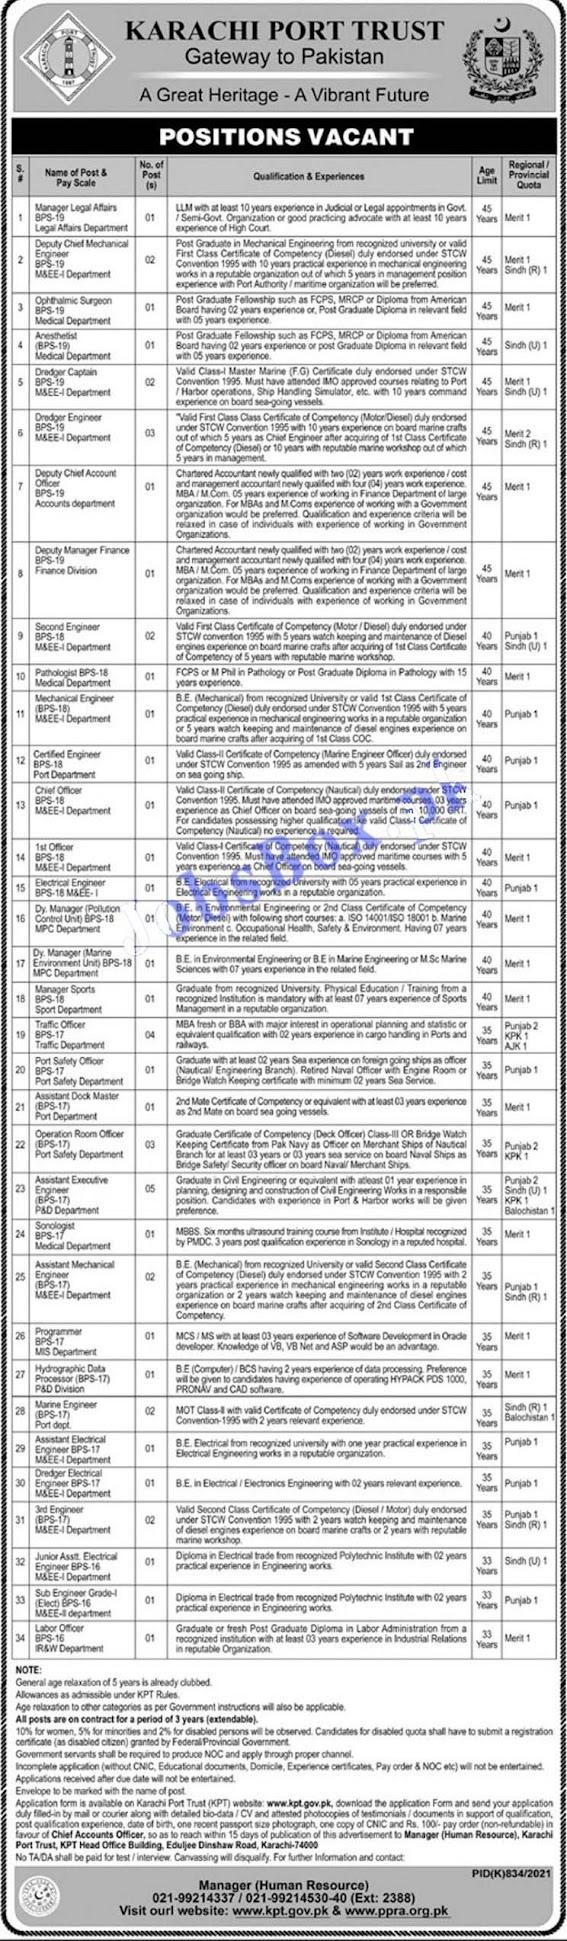 Latest jobs at Karachi Port Trust KPT 2021 - www.kpt.gov.pk